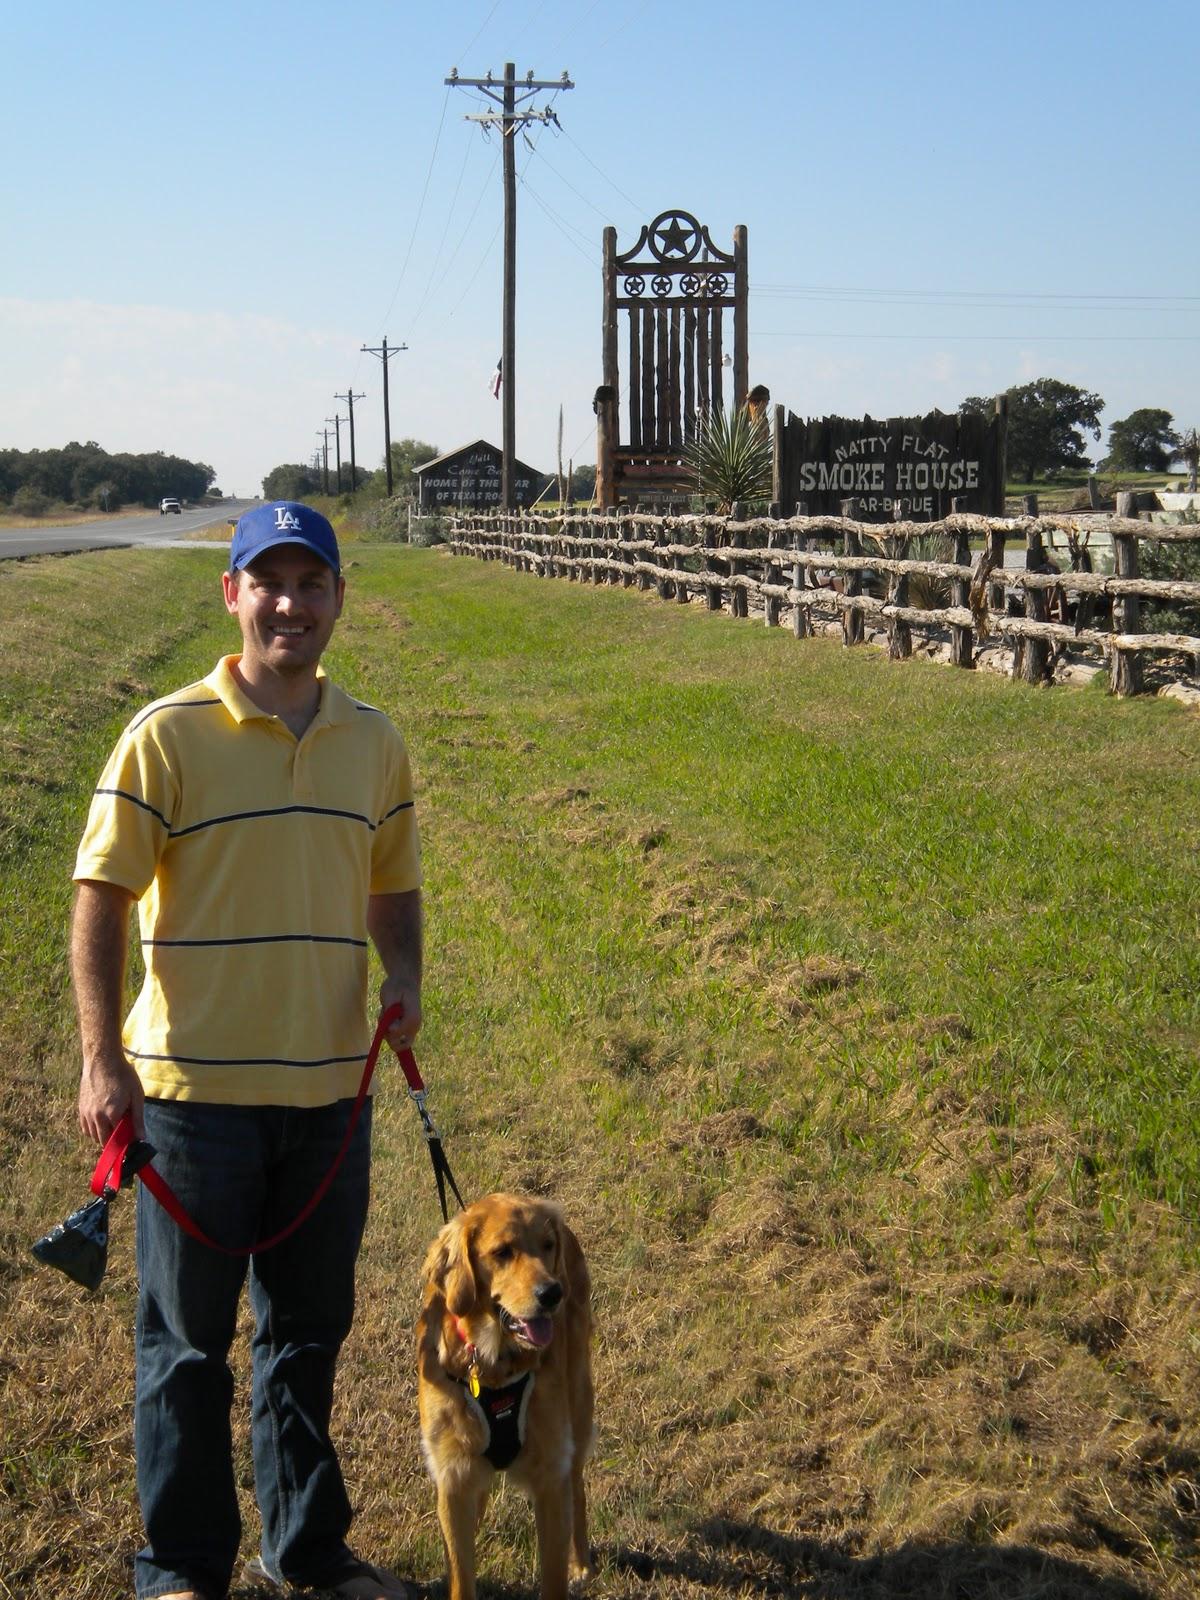 Swell Ron Kelly More Texas Roswell Sedona Frankydiablos Diy Chair Ideas Frankydiabloscom